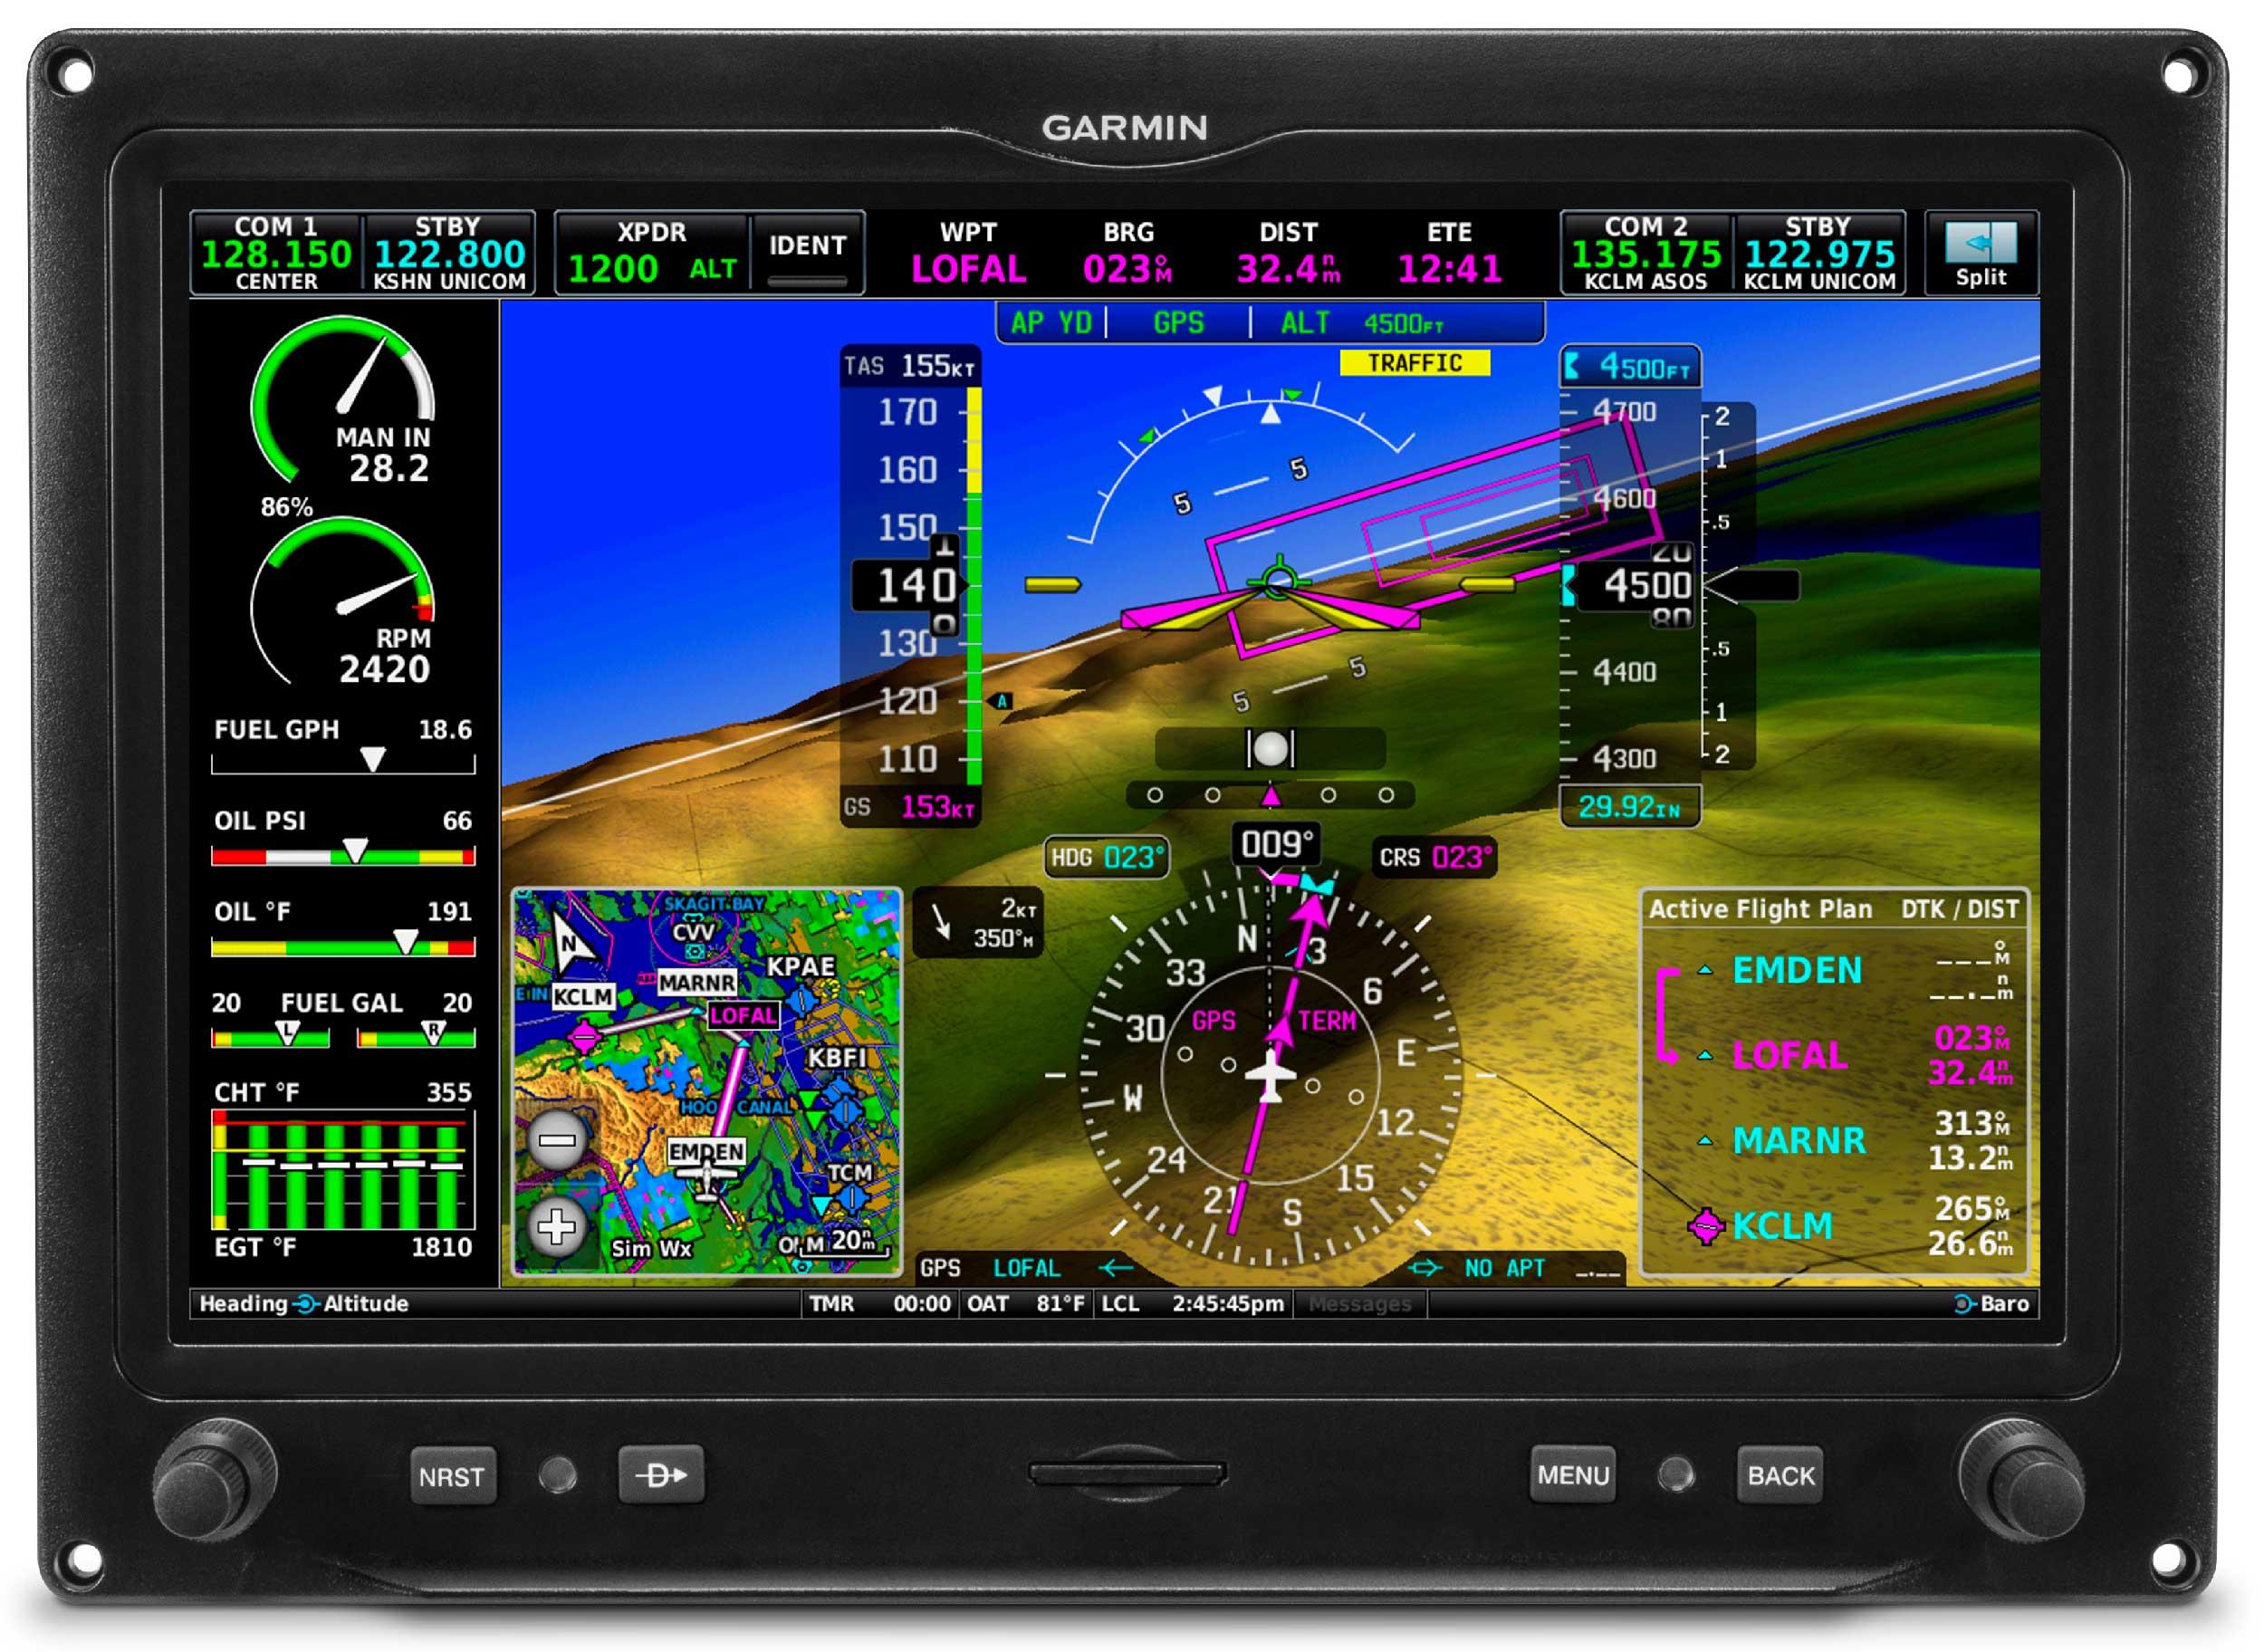 Garmin certifies G3X Touch, launches new navigator units - FLYER